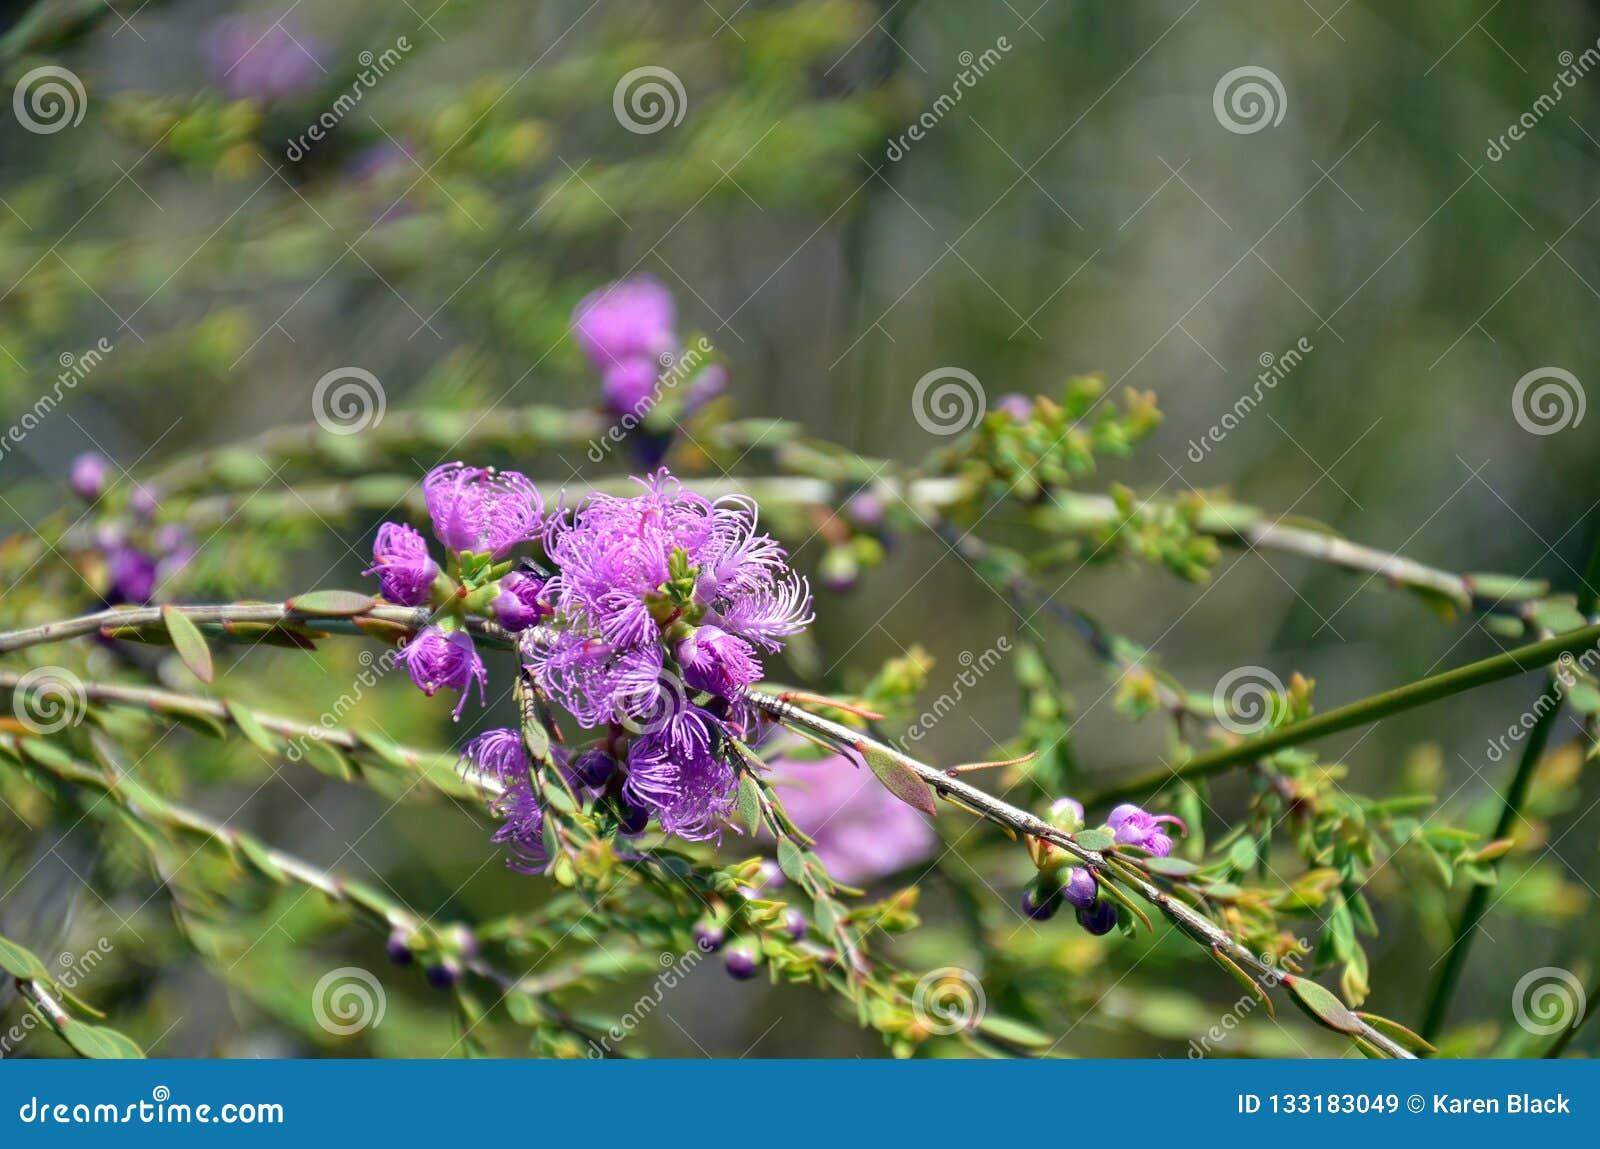 Australian native Thyme-leaf Honey Myrtle